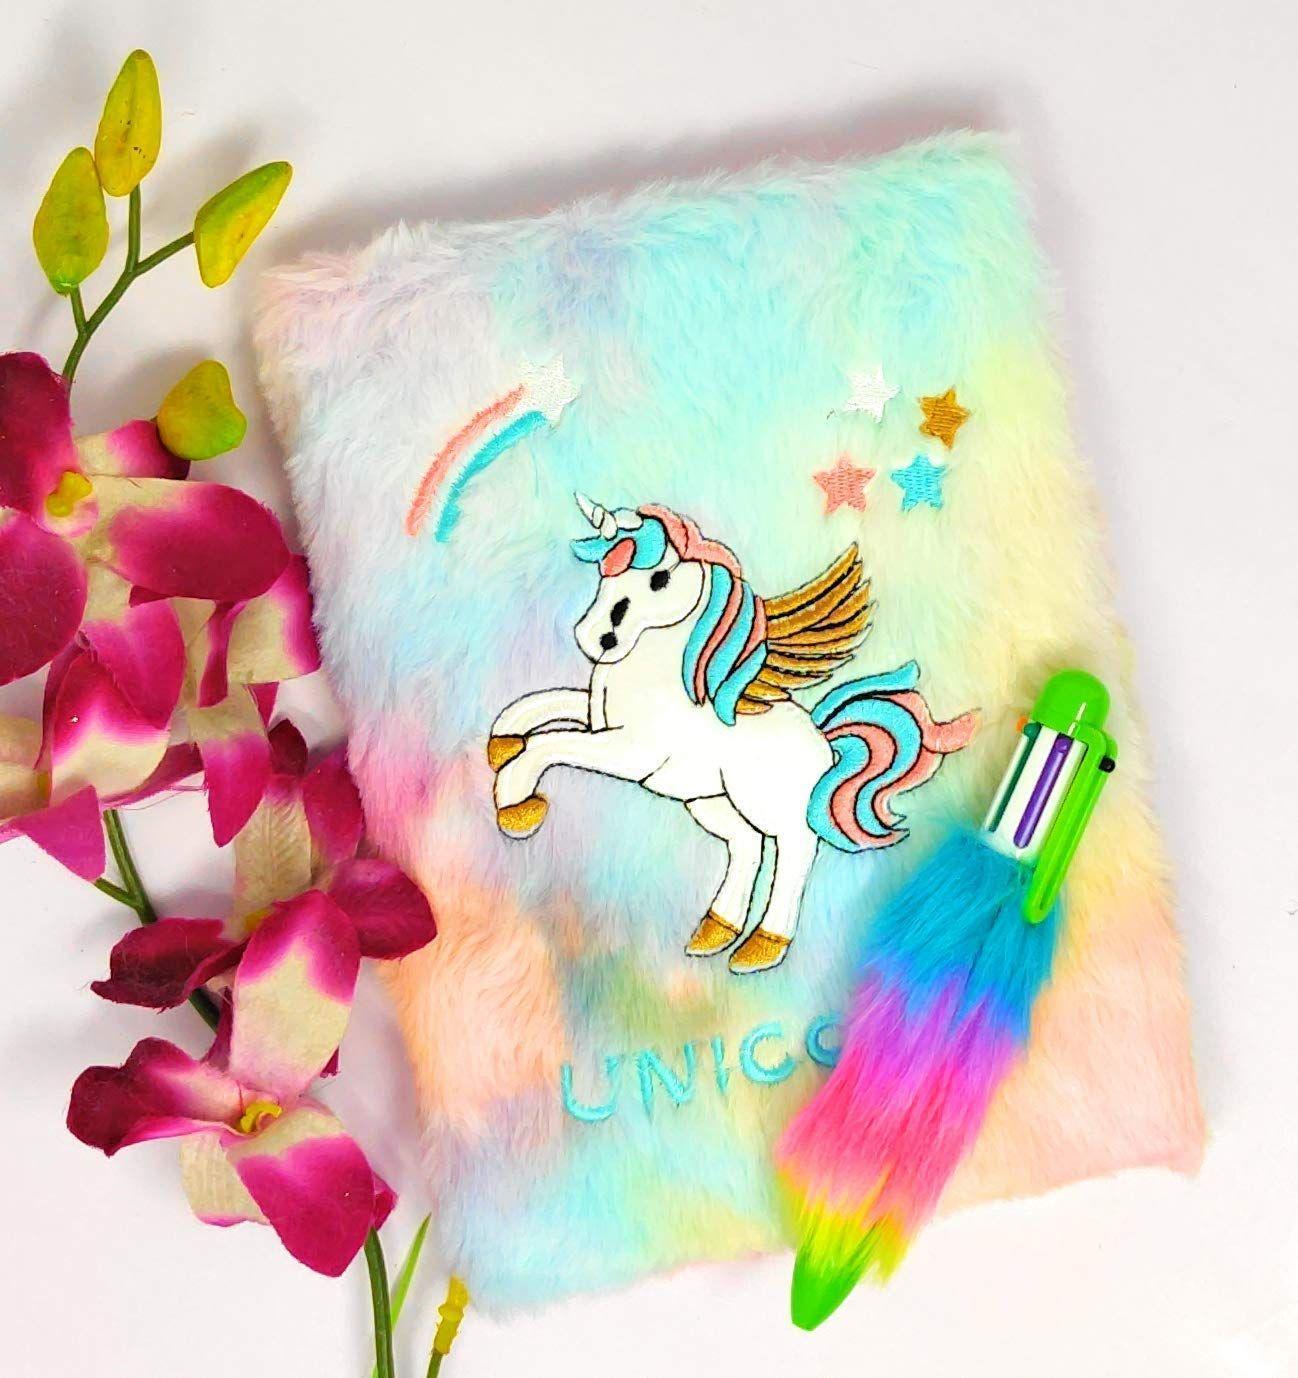 Tera13 Pack Of 2 Unicorn Diary With Pen Unicorn Diary Unicorn Books Paper Flowers Craft What reading level is unicorn diaries